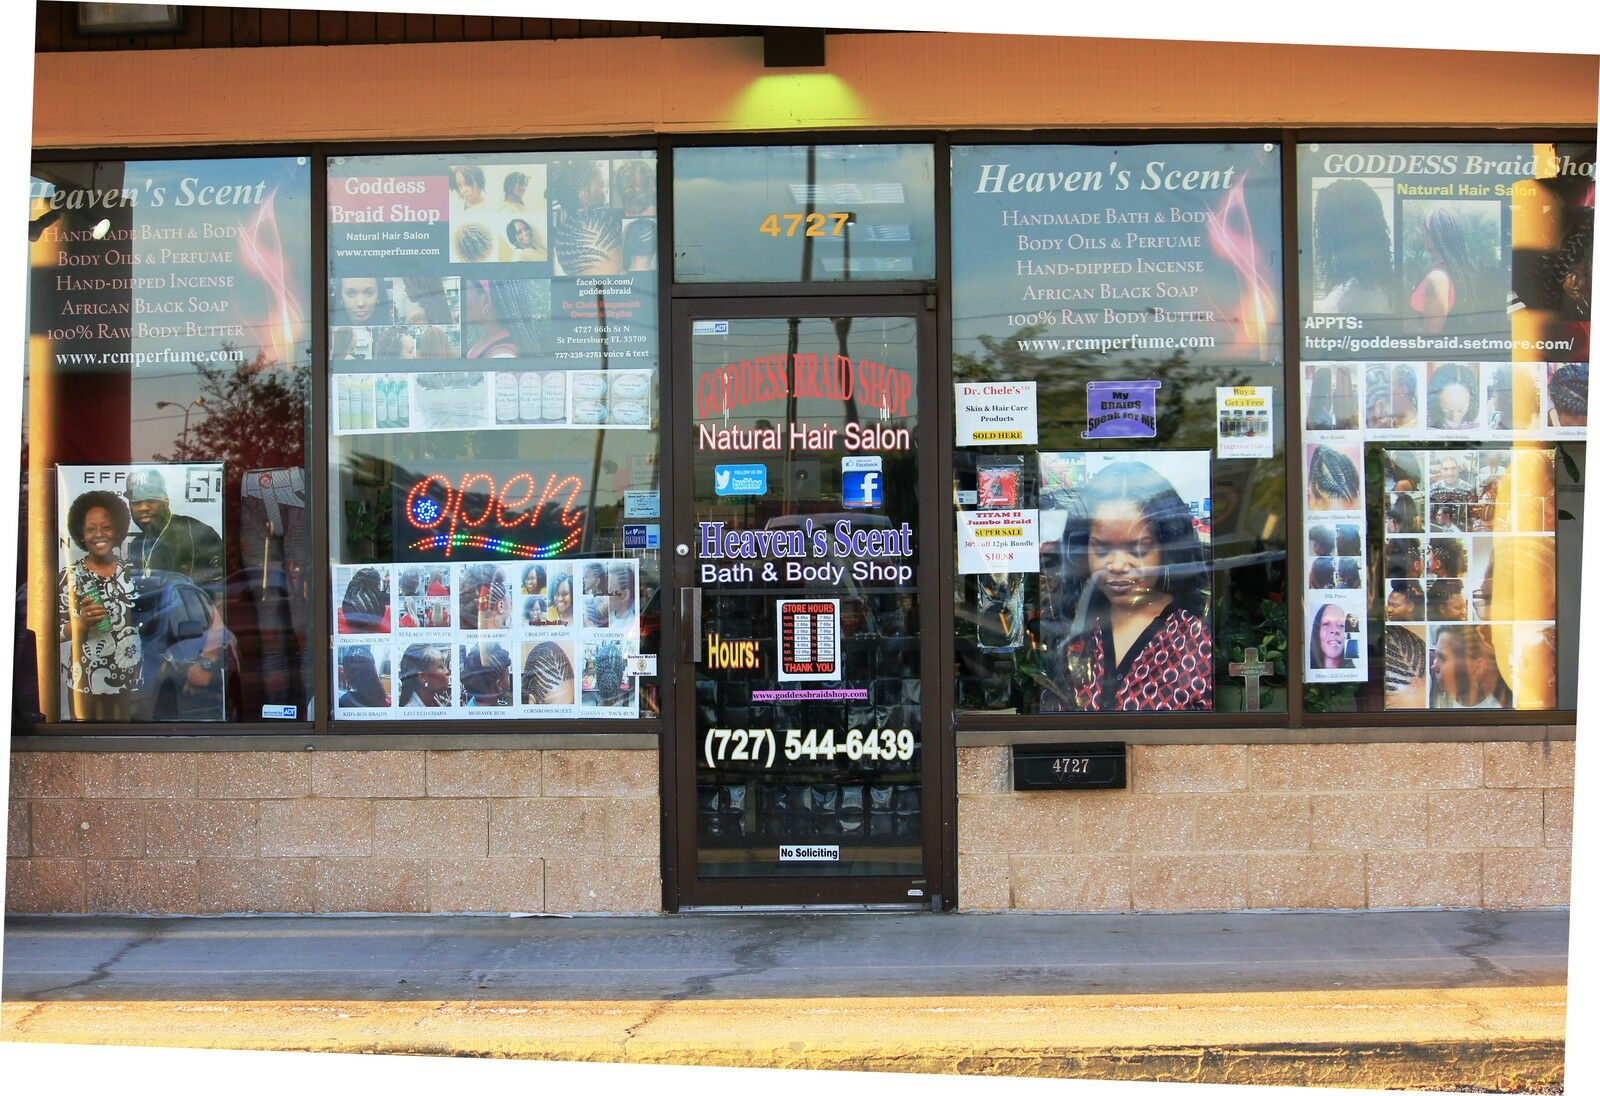 Goddess Braid Shop